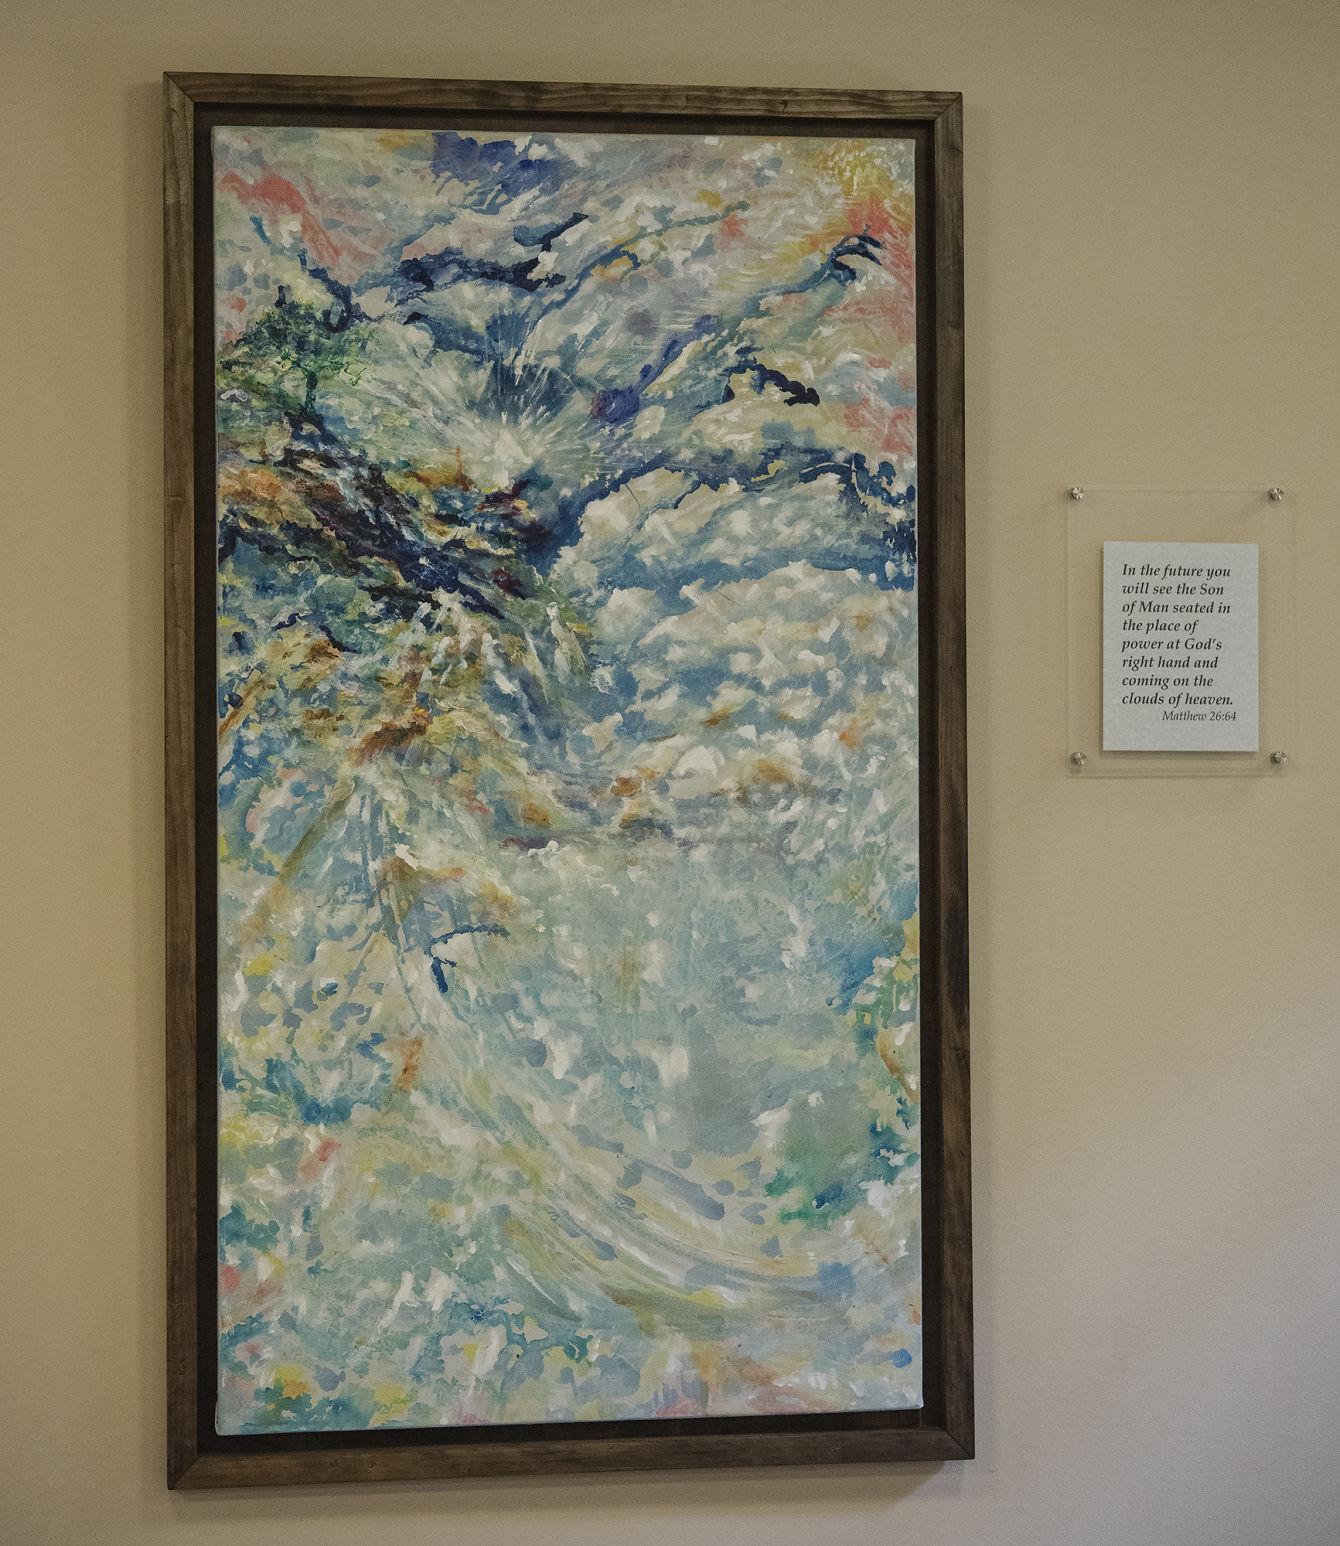 Abstract Art With Foolish Theme